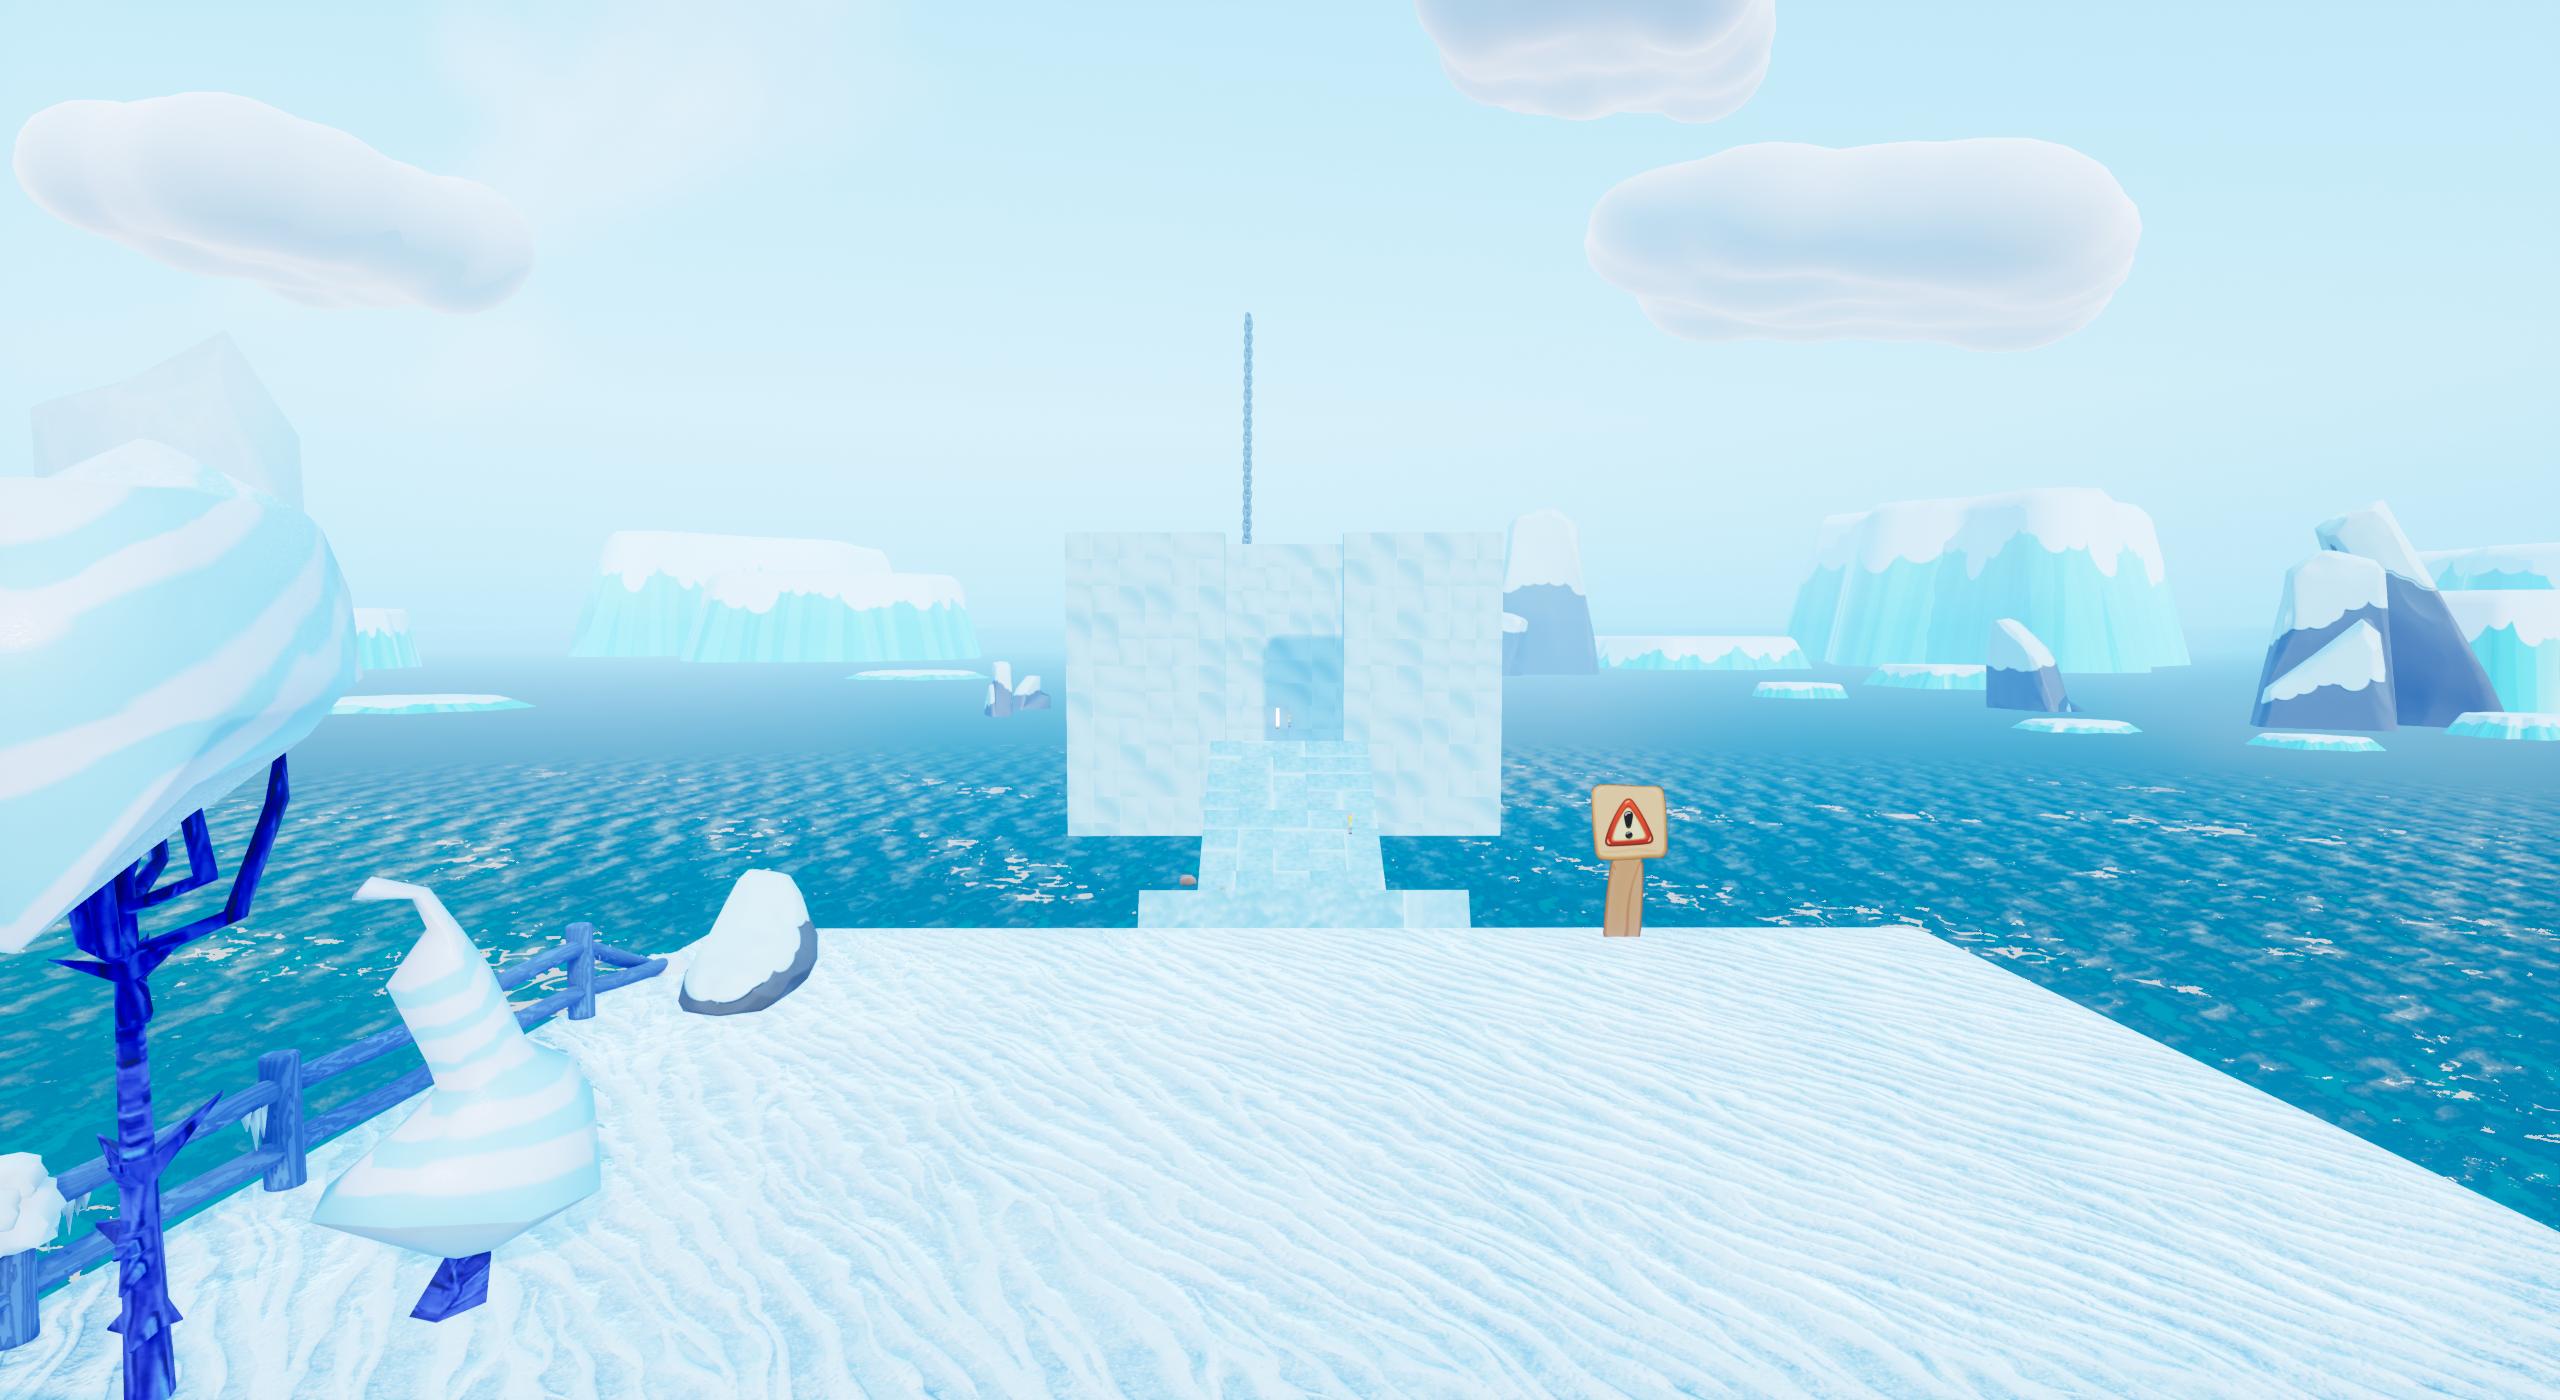 IceLevel04